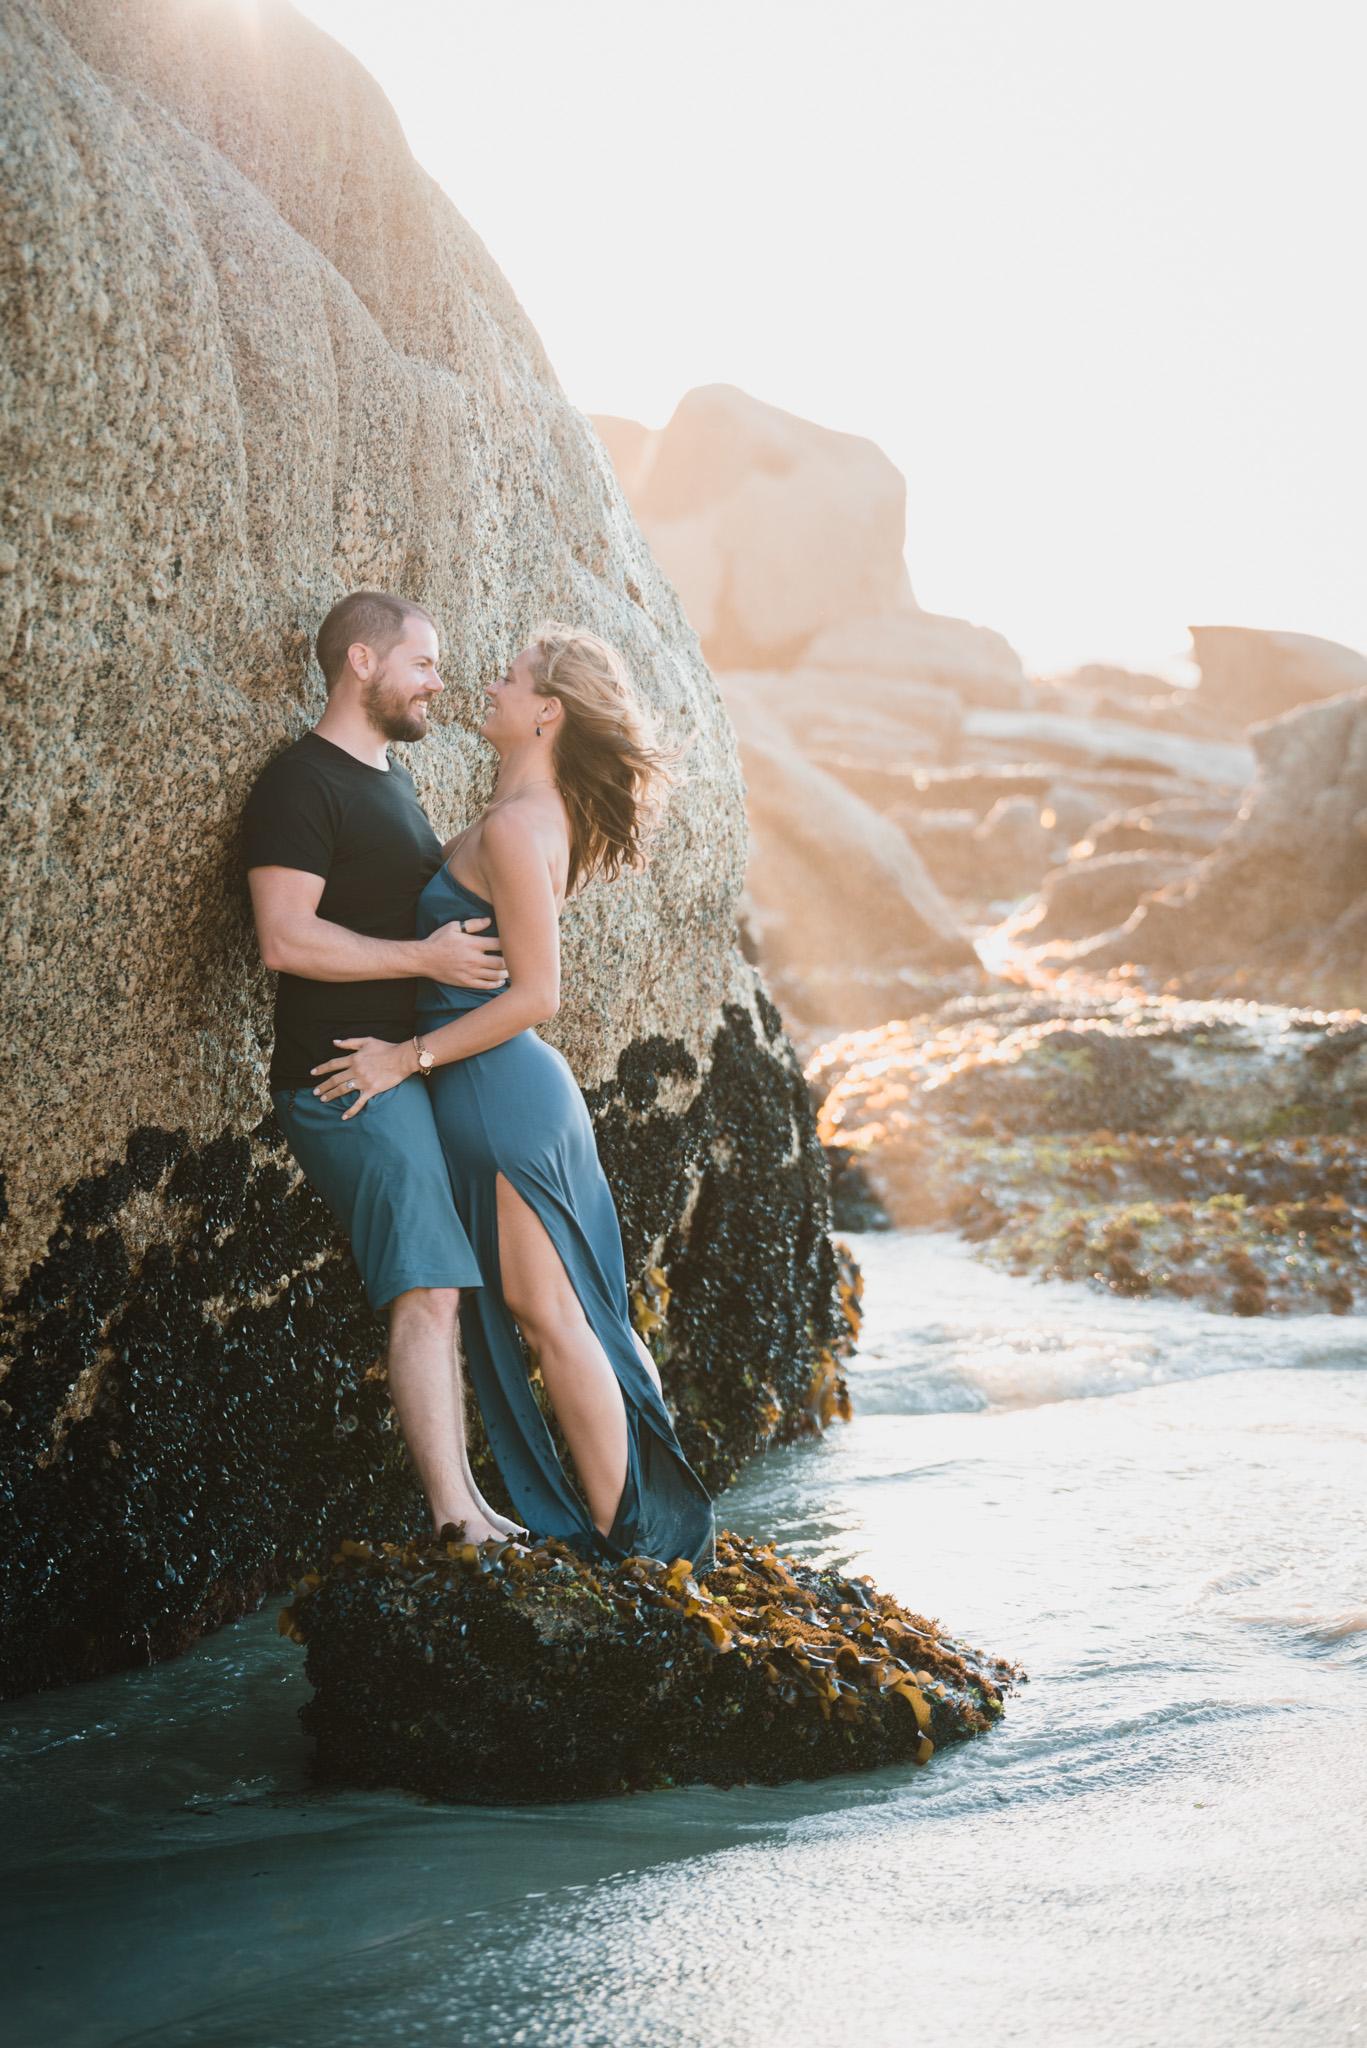 Ross & Candice engagement (128 of 166).JPG